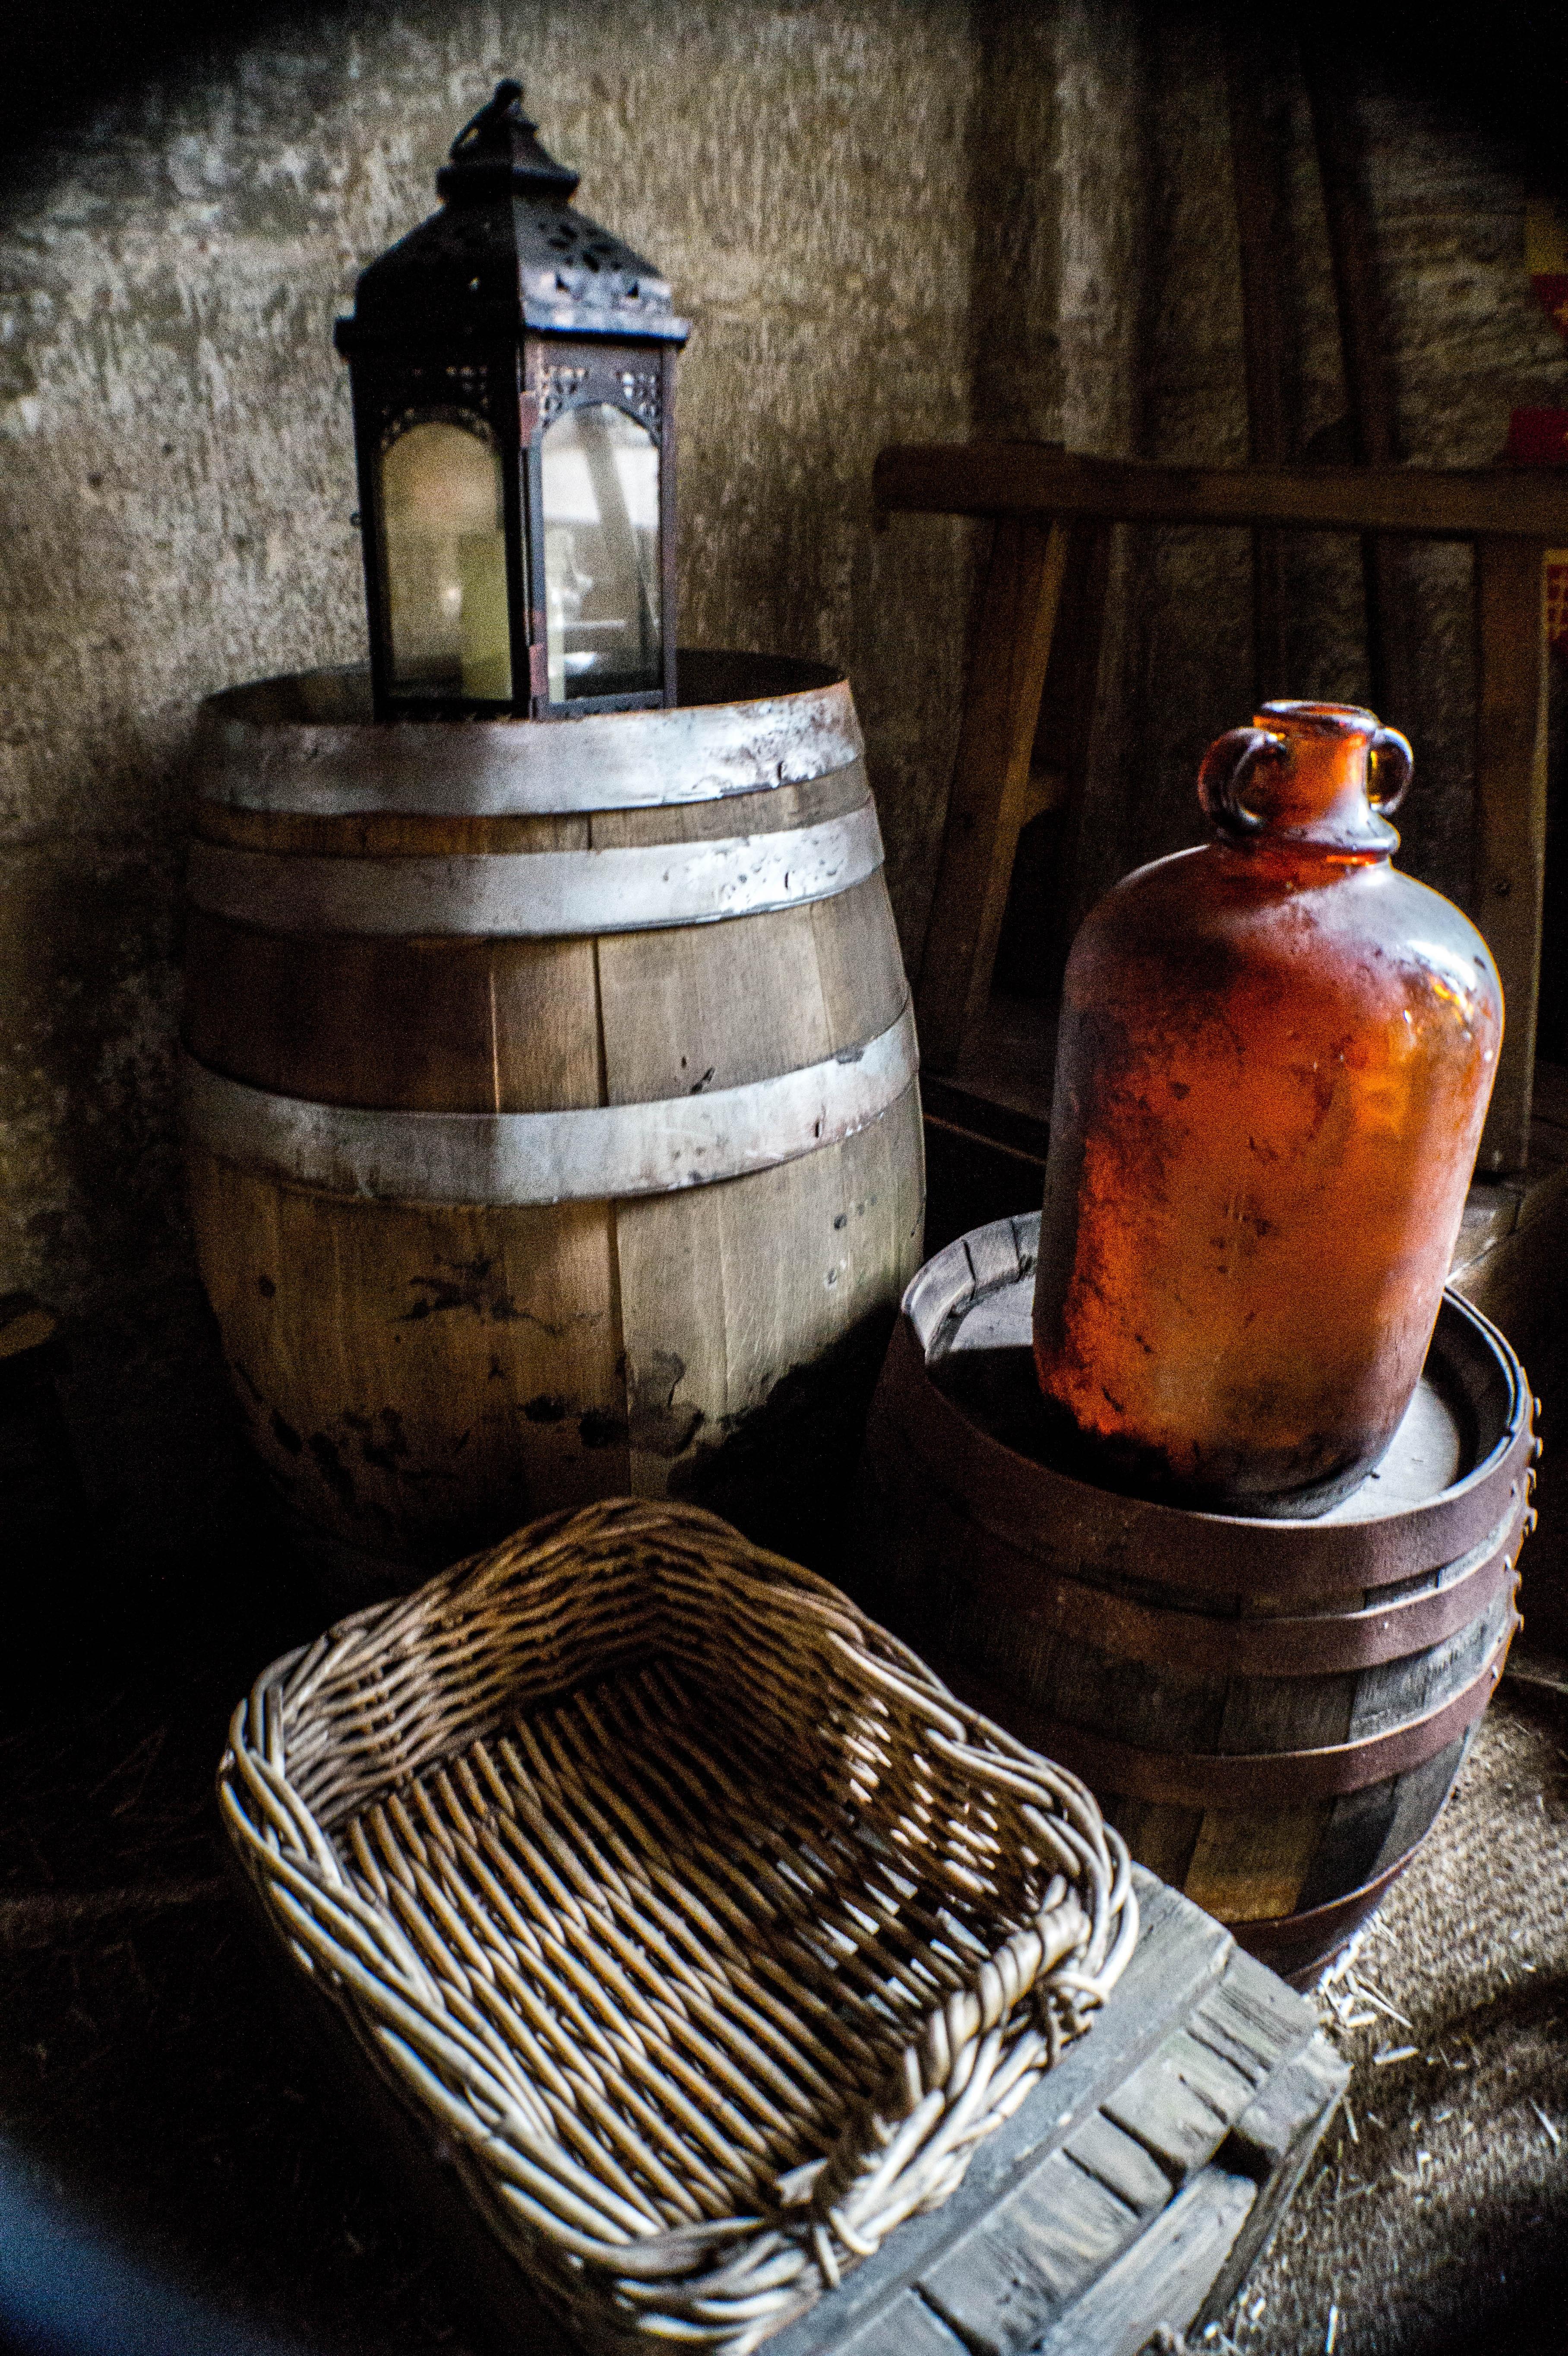 Wood Vintage Old Rustic Lantern Drink Bottle Basket Lighting Still Life Barrel Painting Wicker Glass